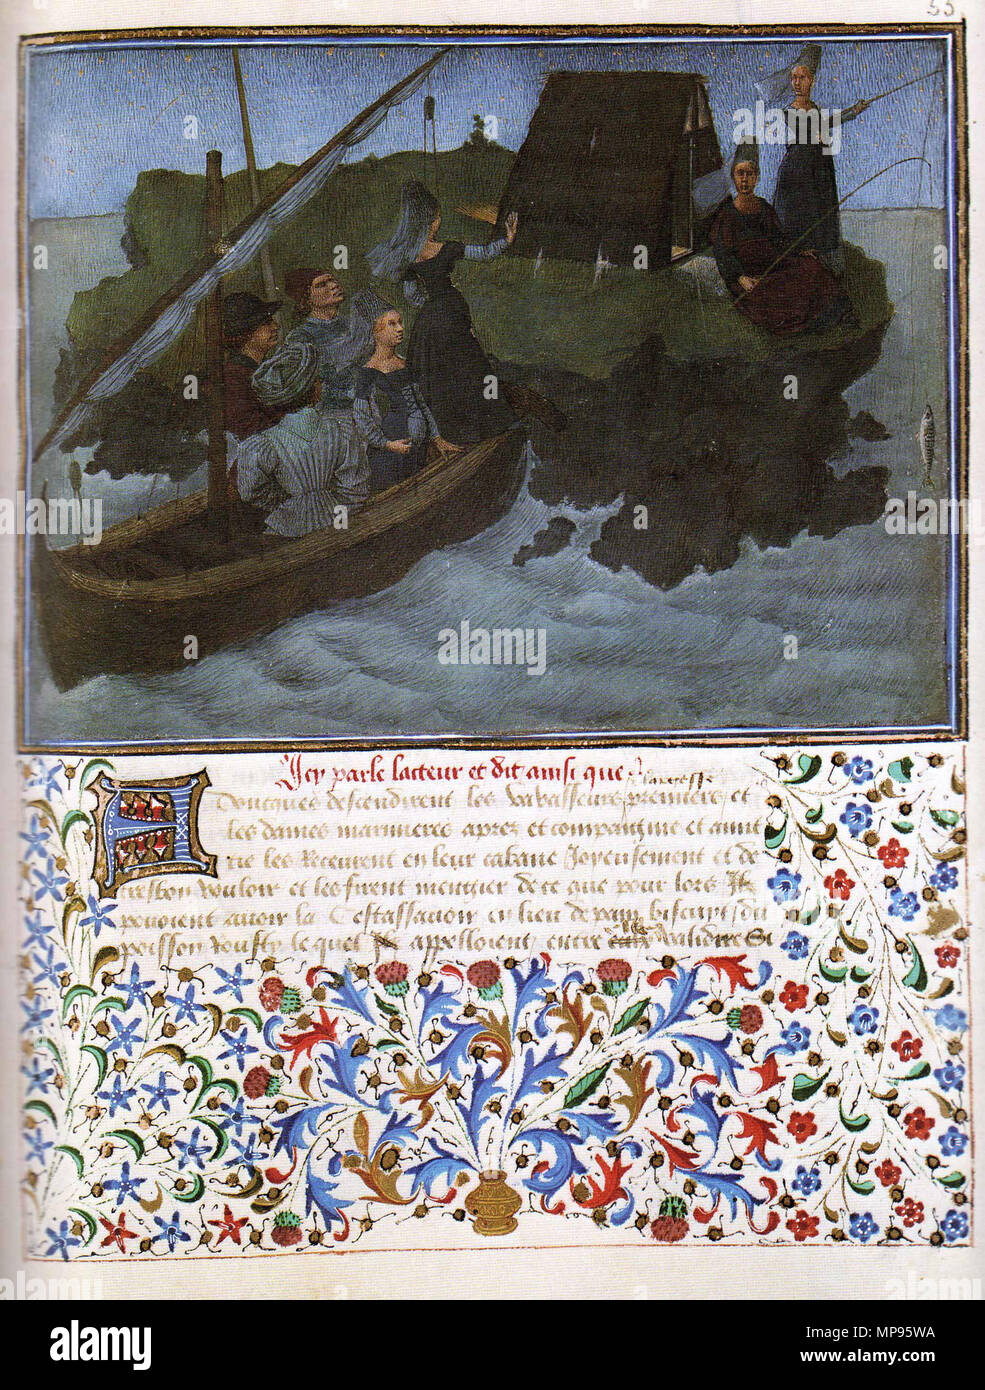 814 Livre Du Coeur Damour Vidobo épris2597 F55 Foto